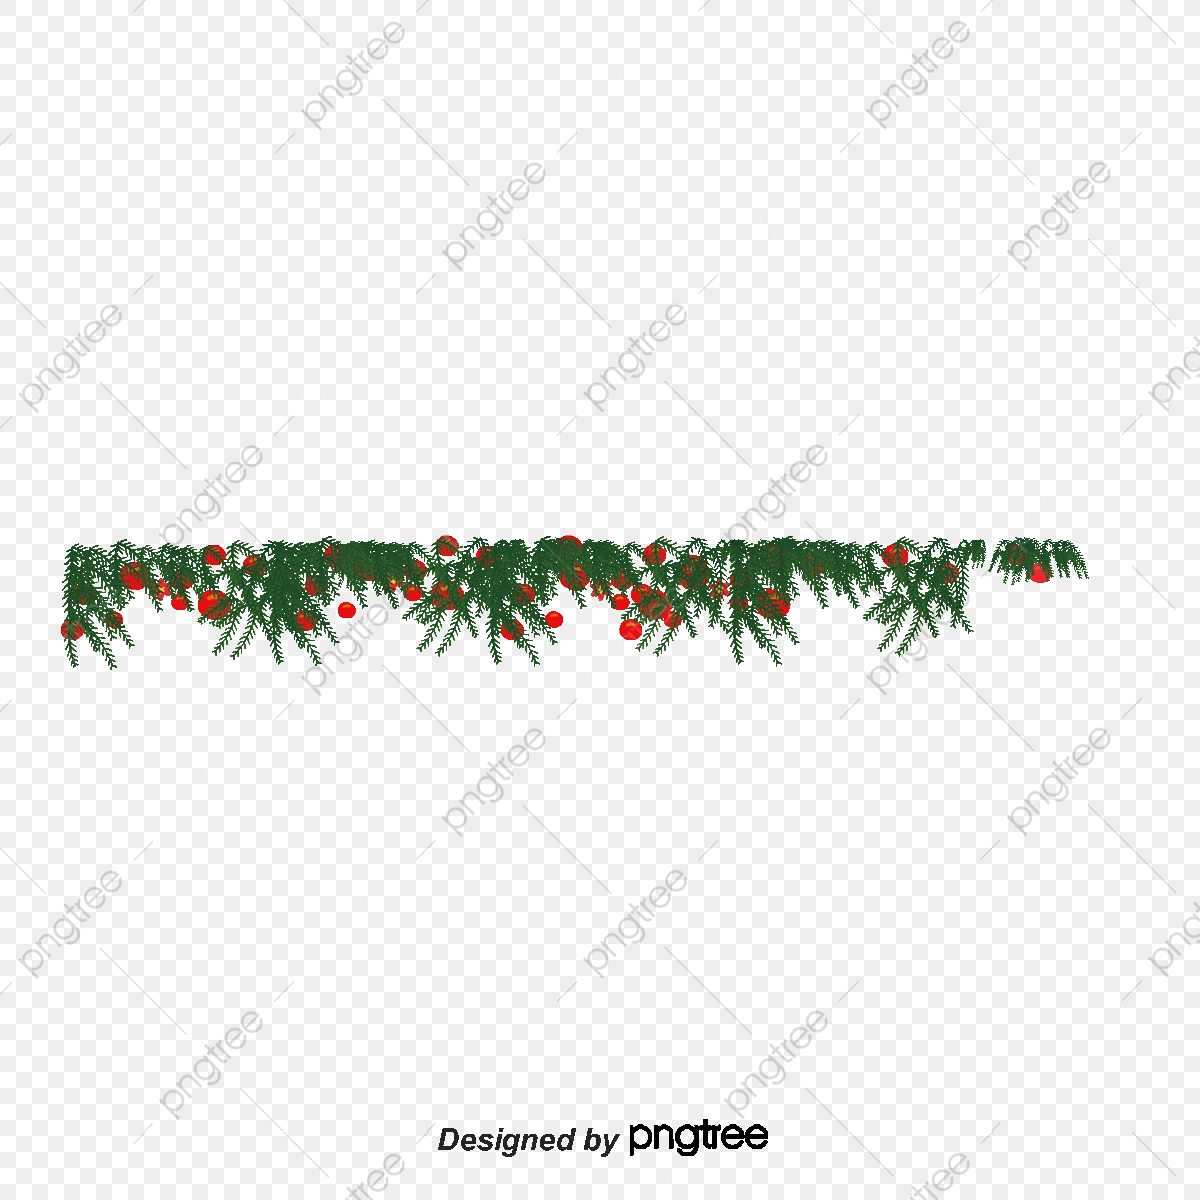 Christmas Tree Border png download - 958*867 - Free Transparent Santa Claus  png Download. - CleanPNG / KissPNG